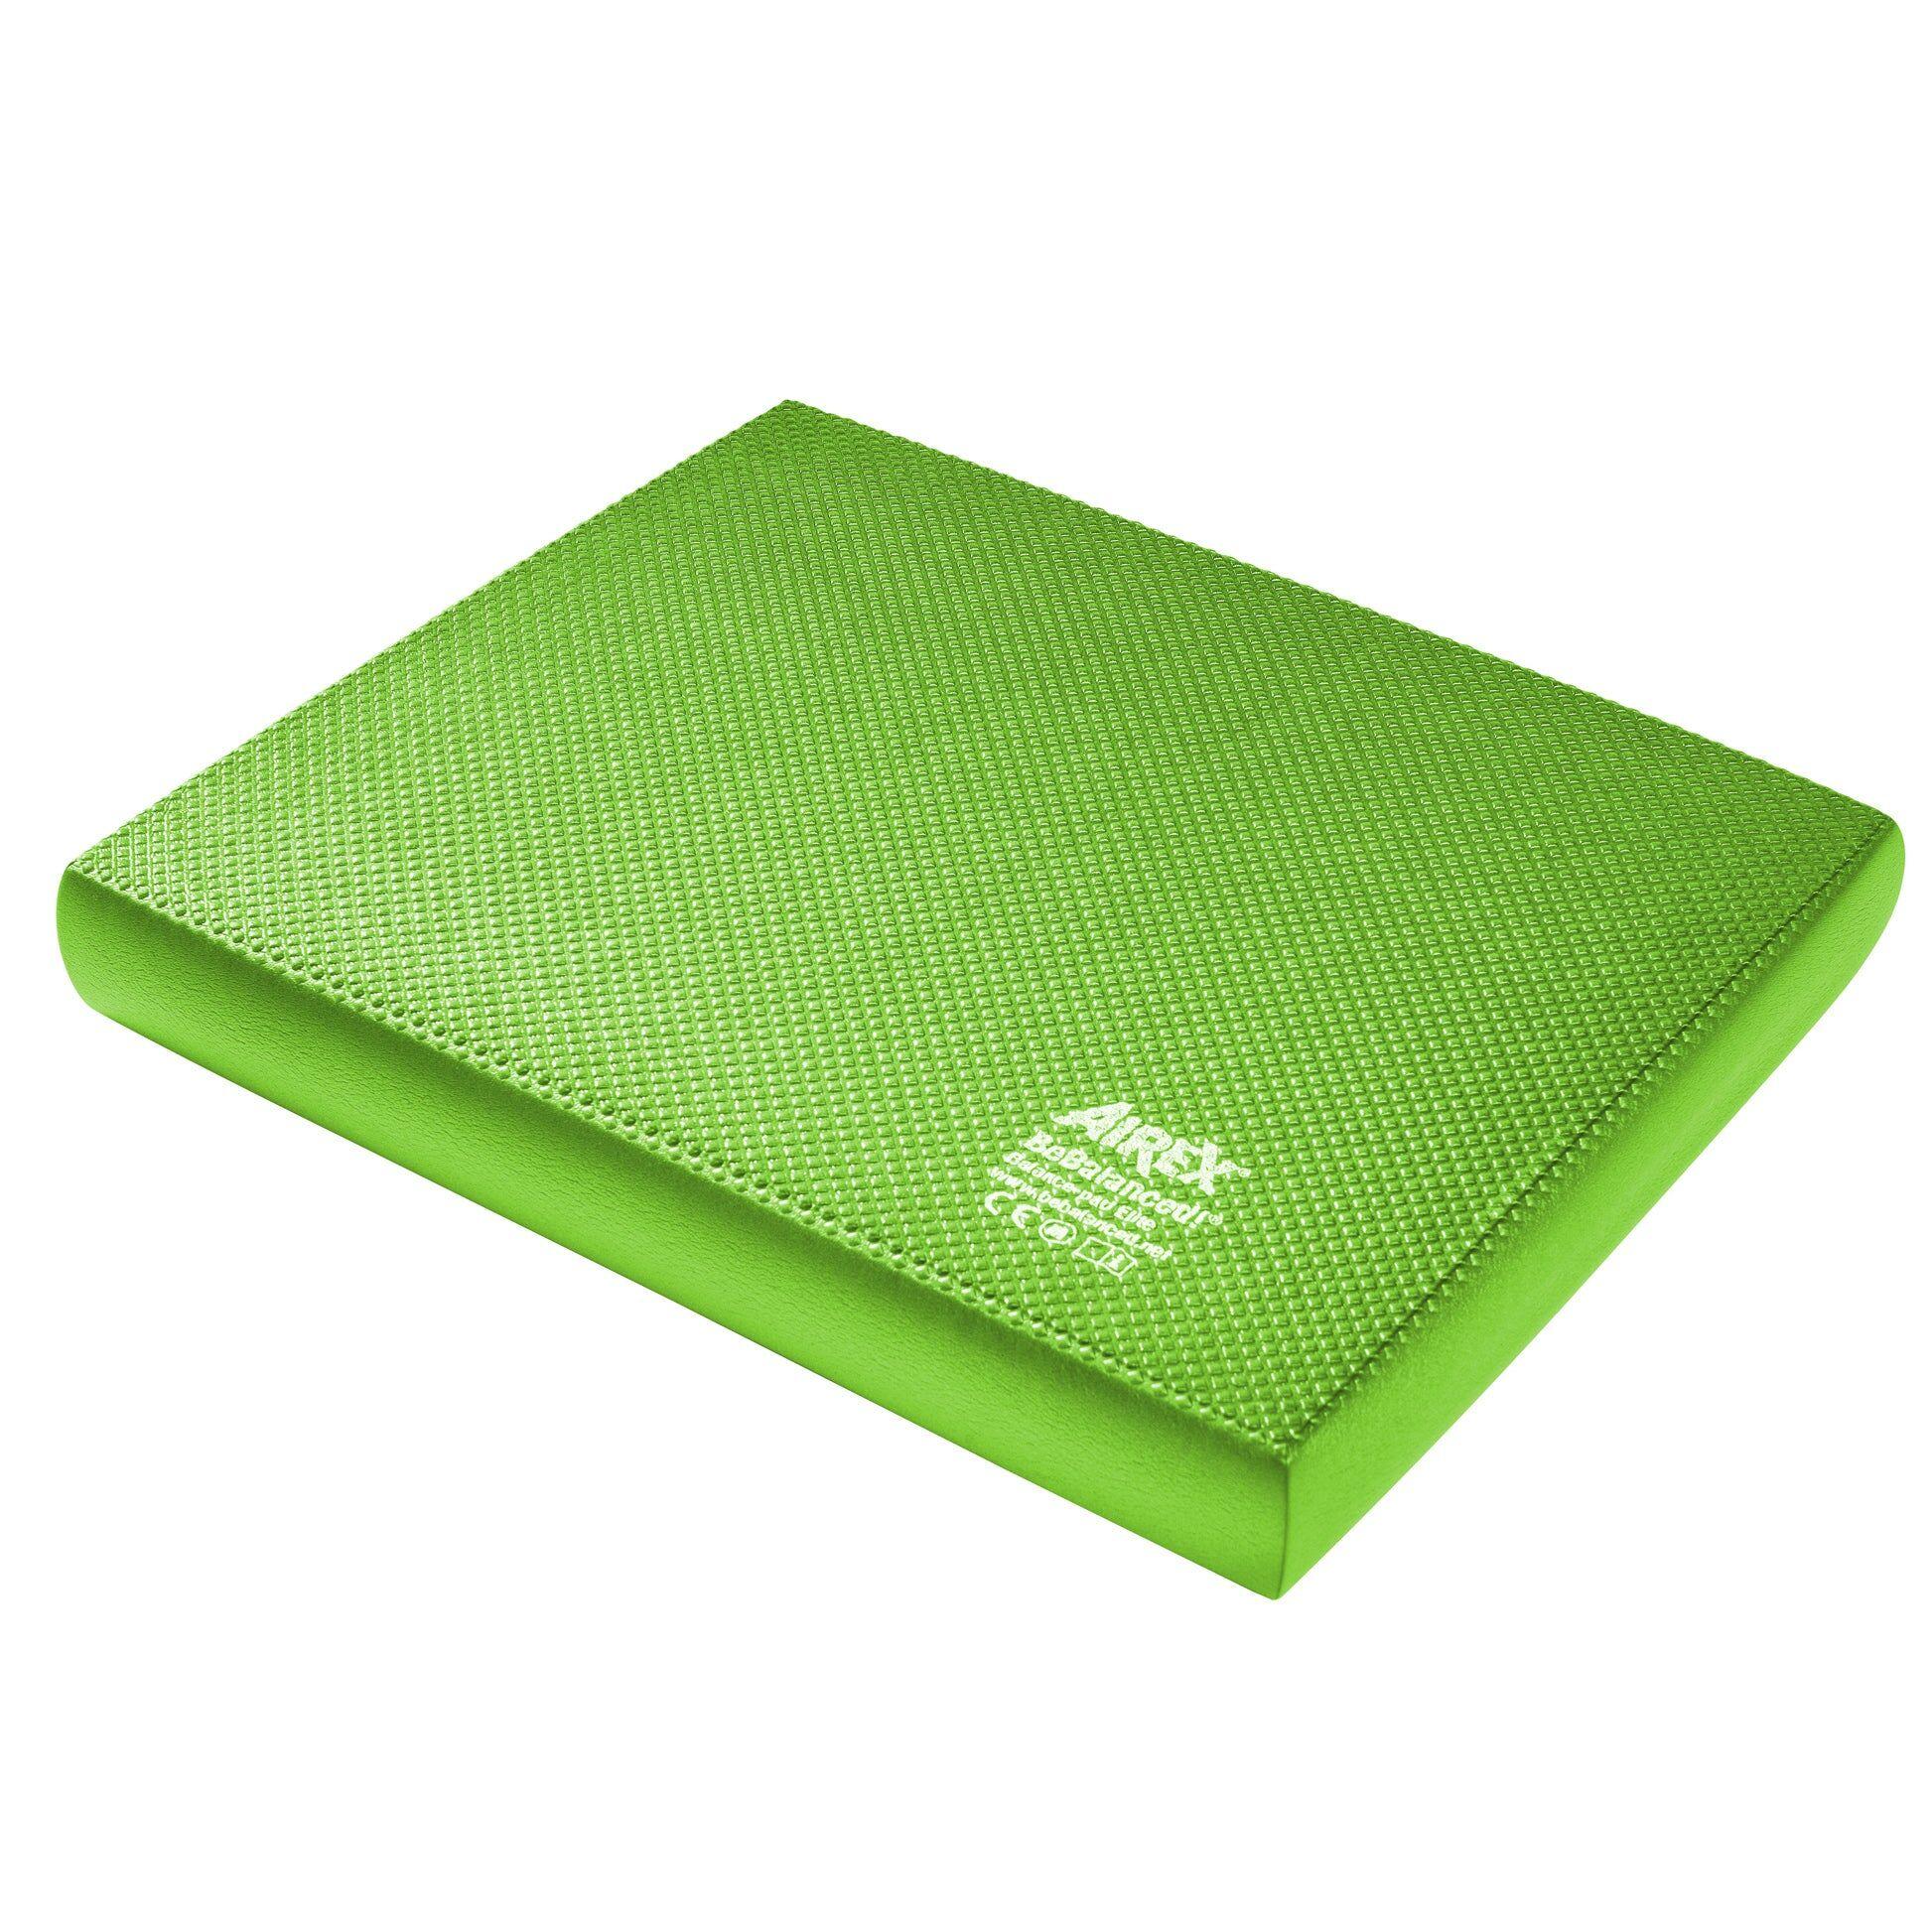 Spri Airex® Balance Pad Elite  - green